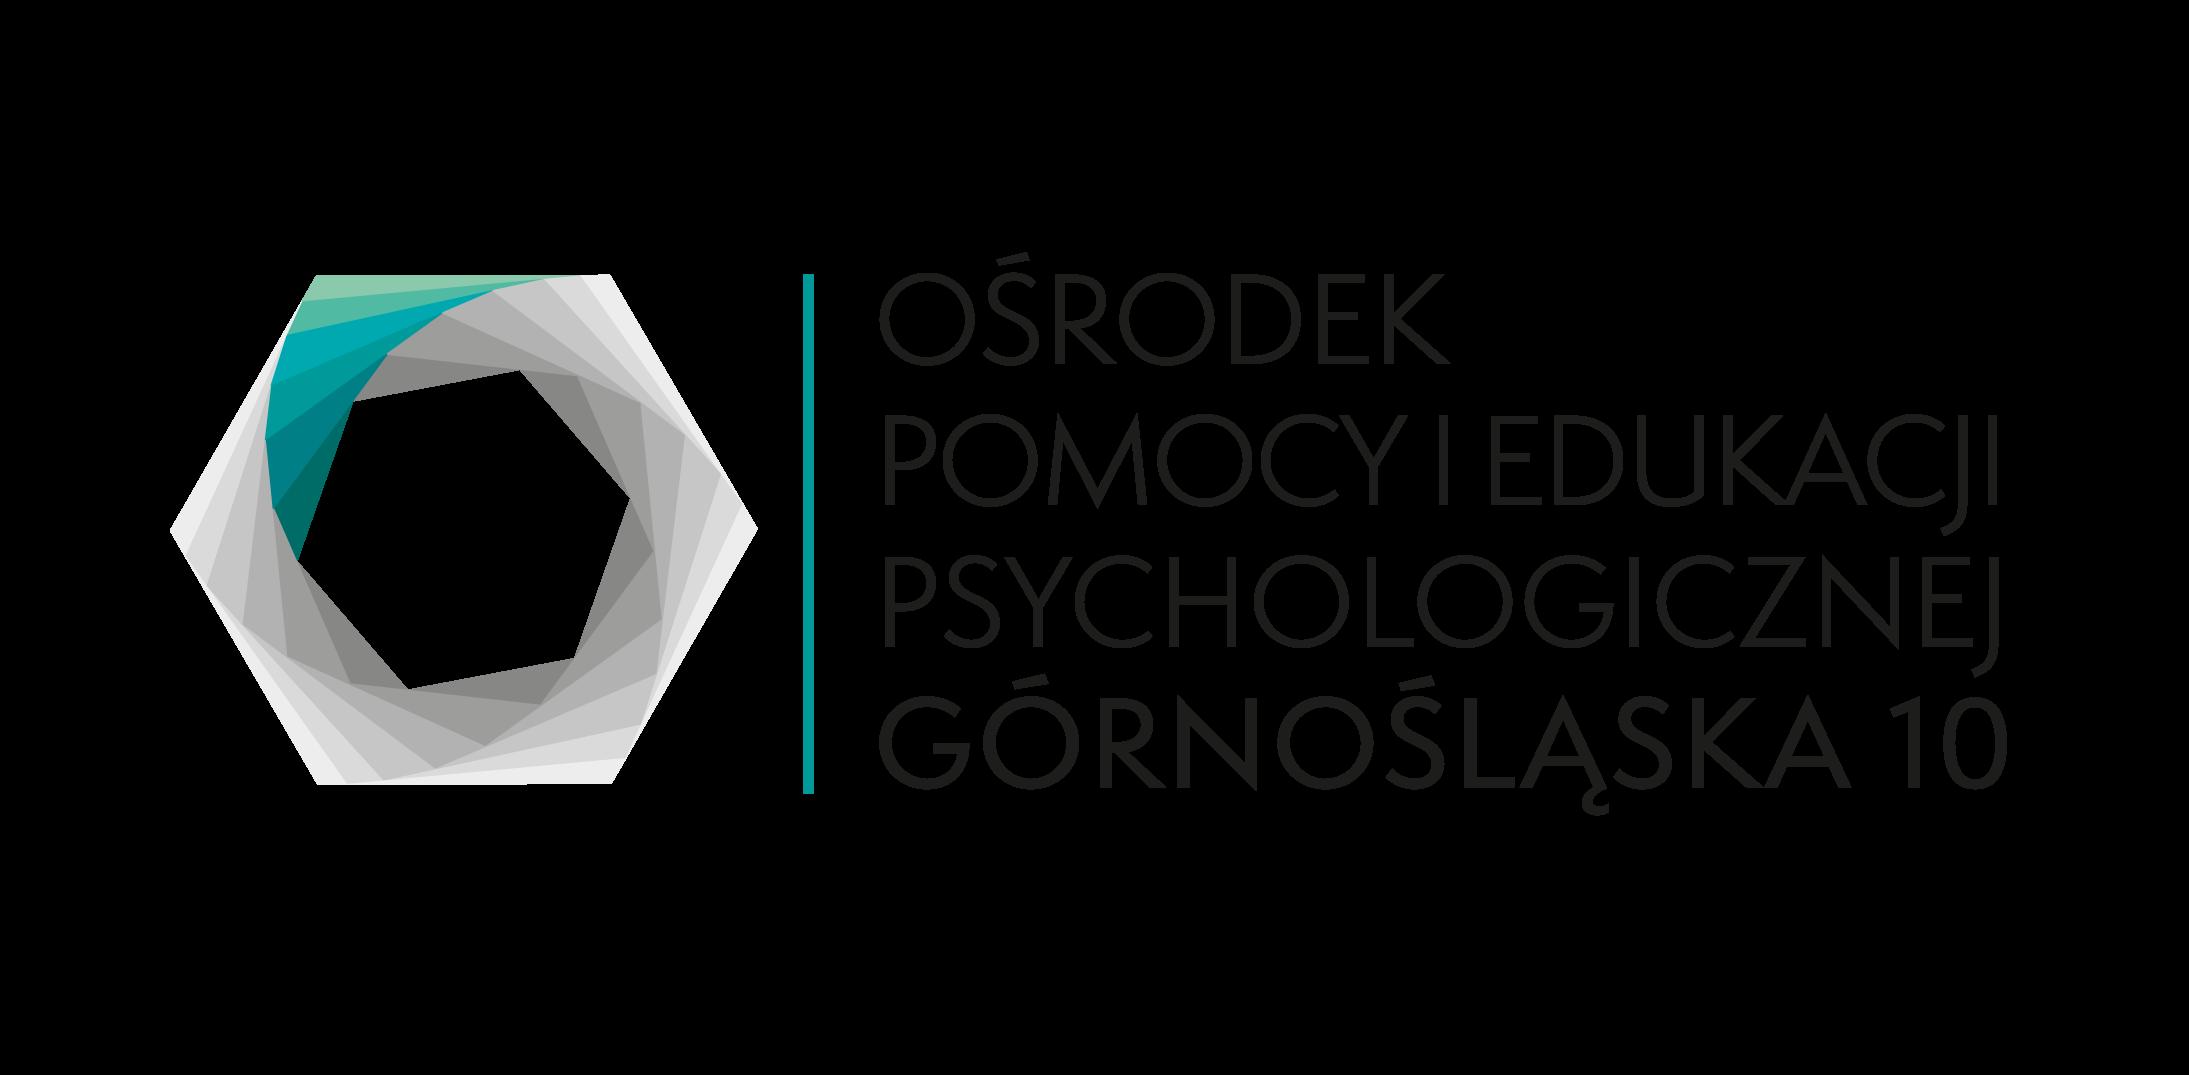 Ośrodek pomocy psychologicznej